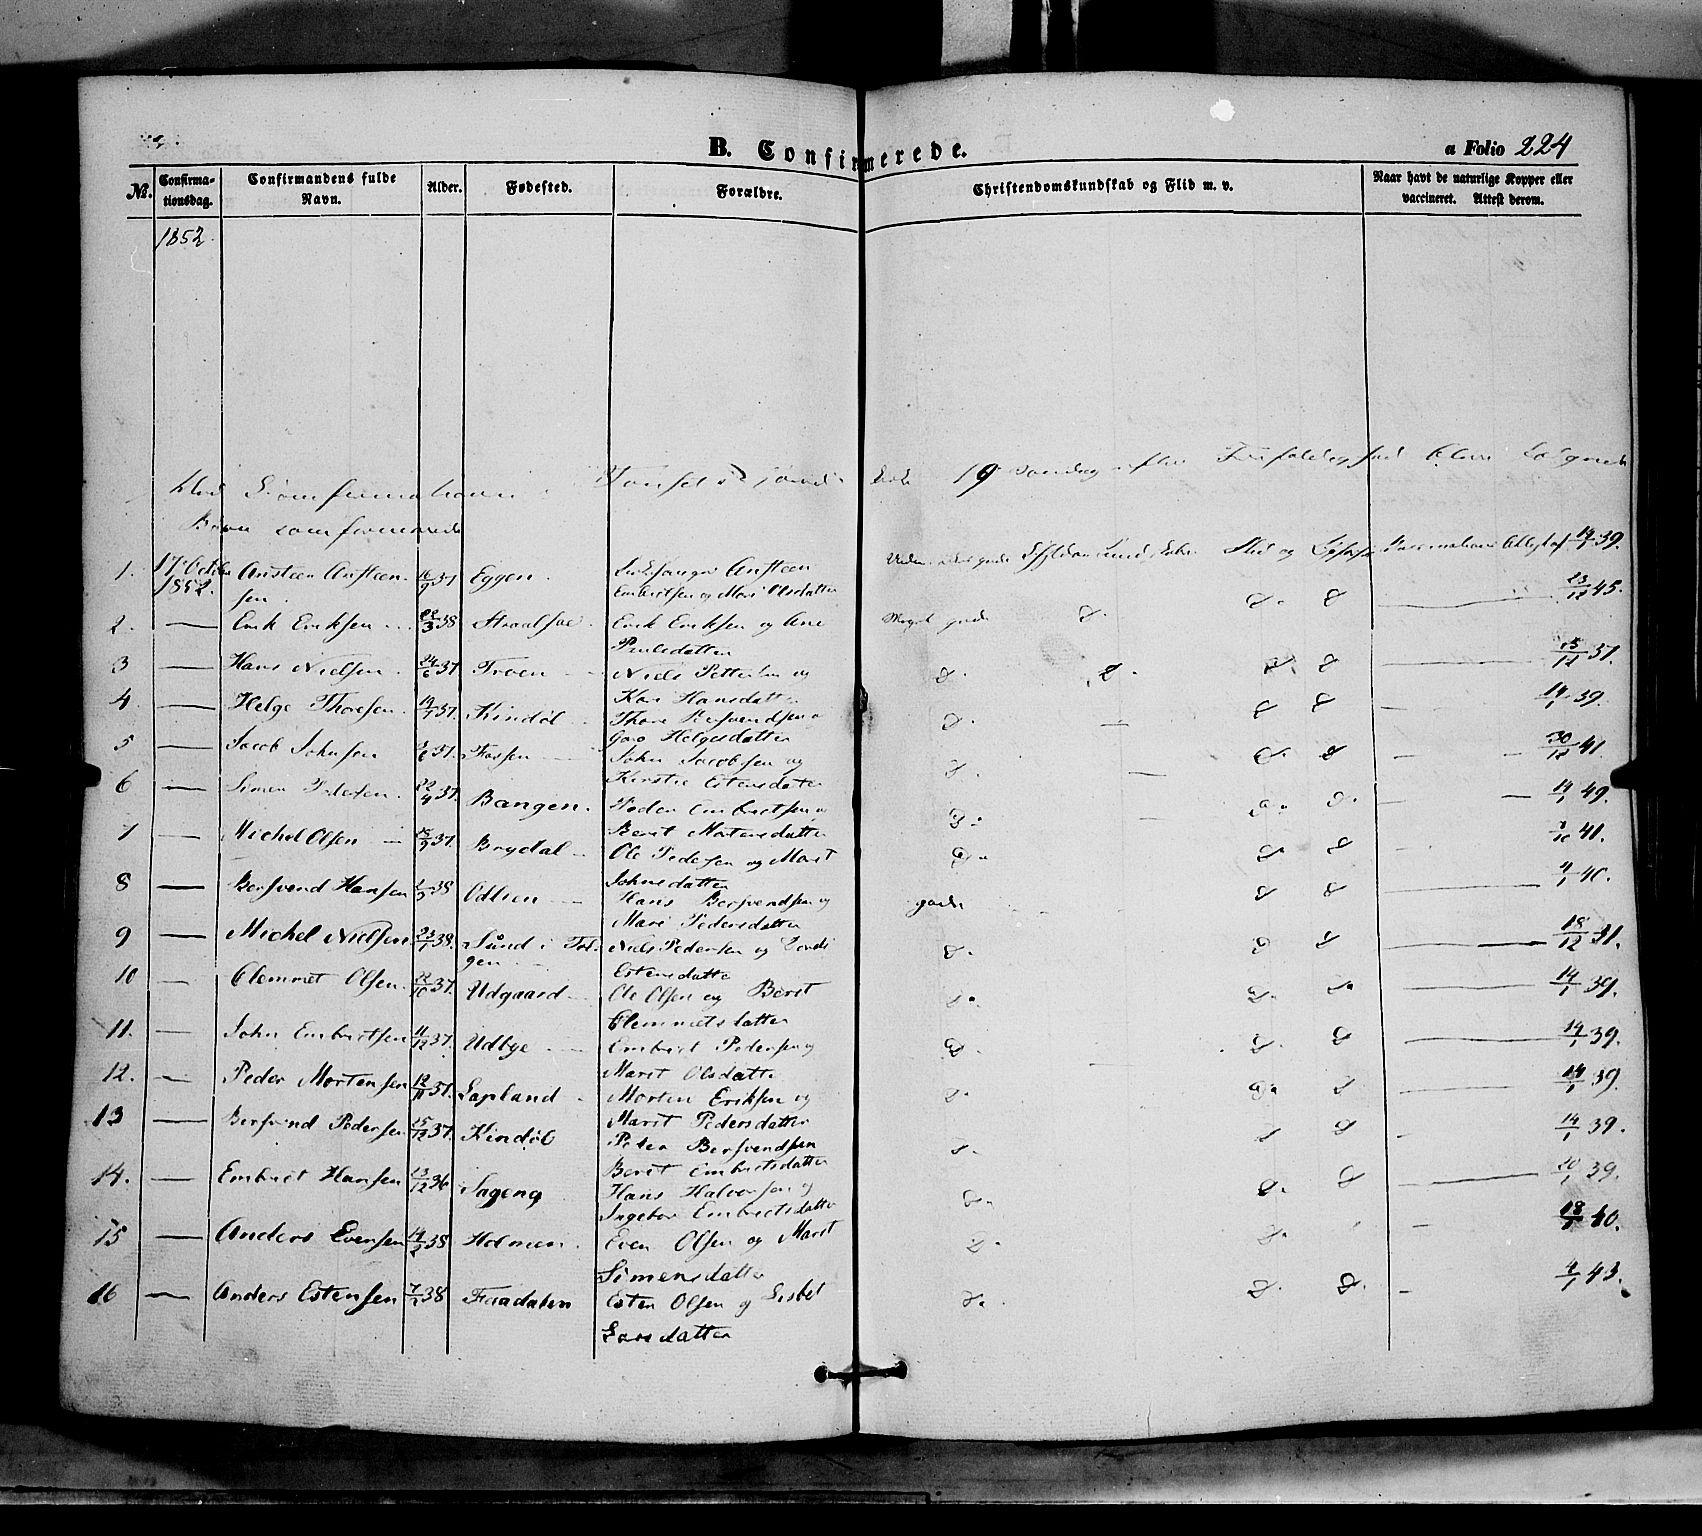 SAH, Tynset prestekontor, Ministerialbok nr. 20, 1848-1862, s. 224